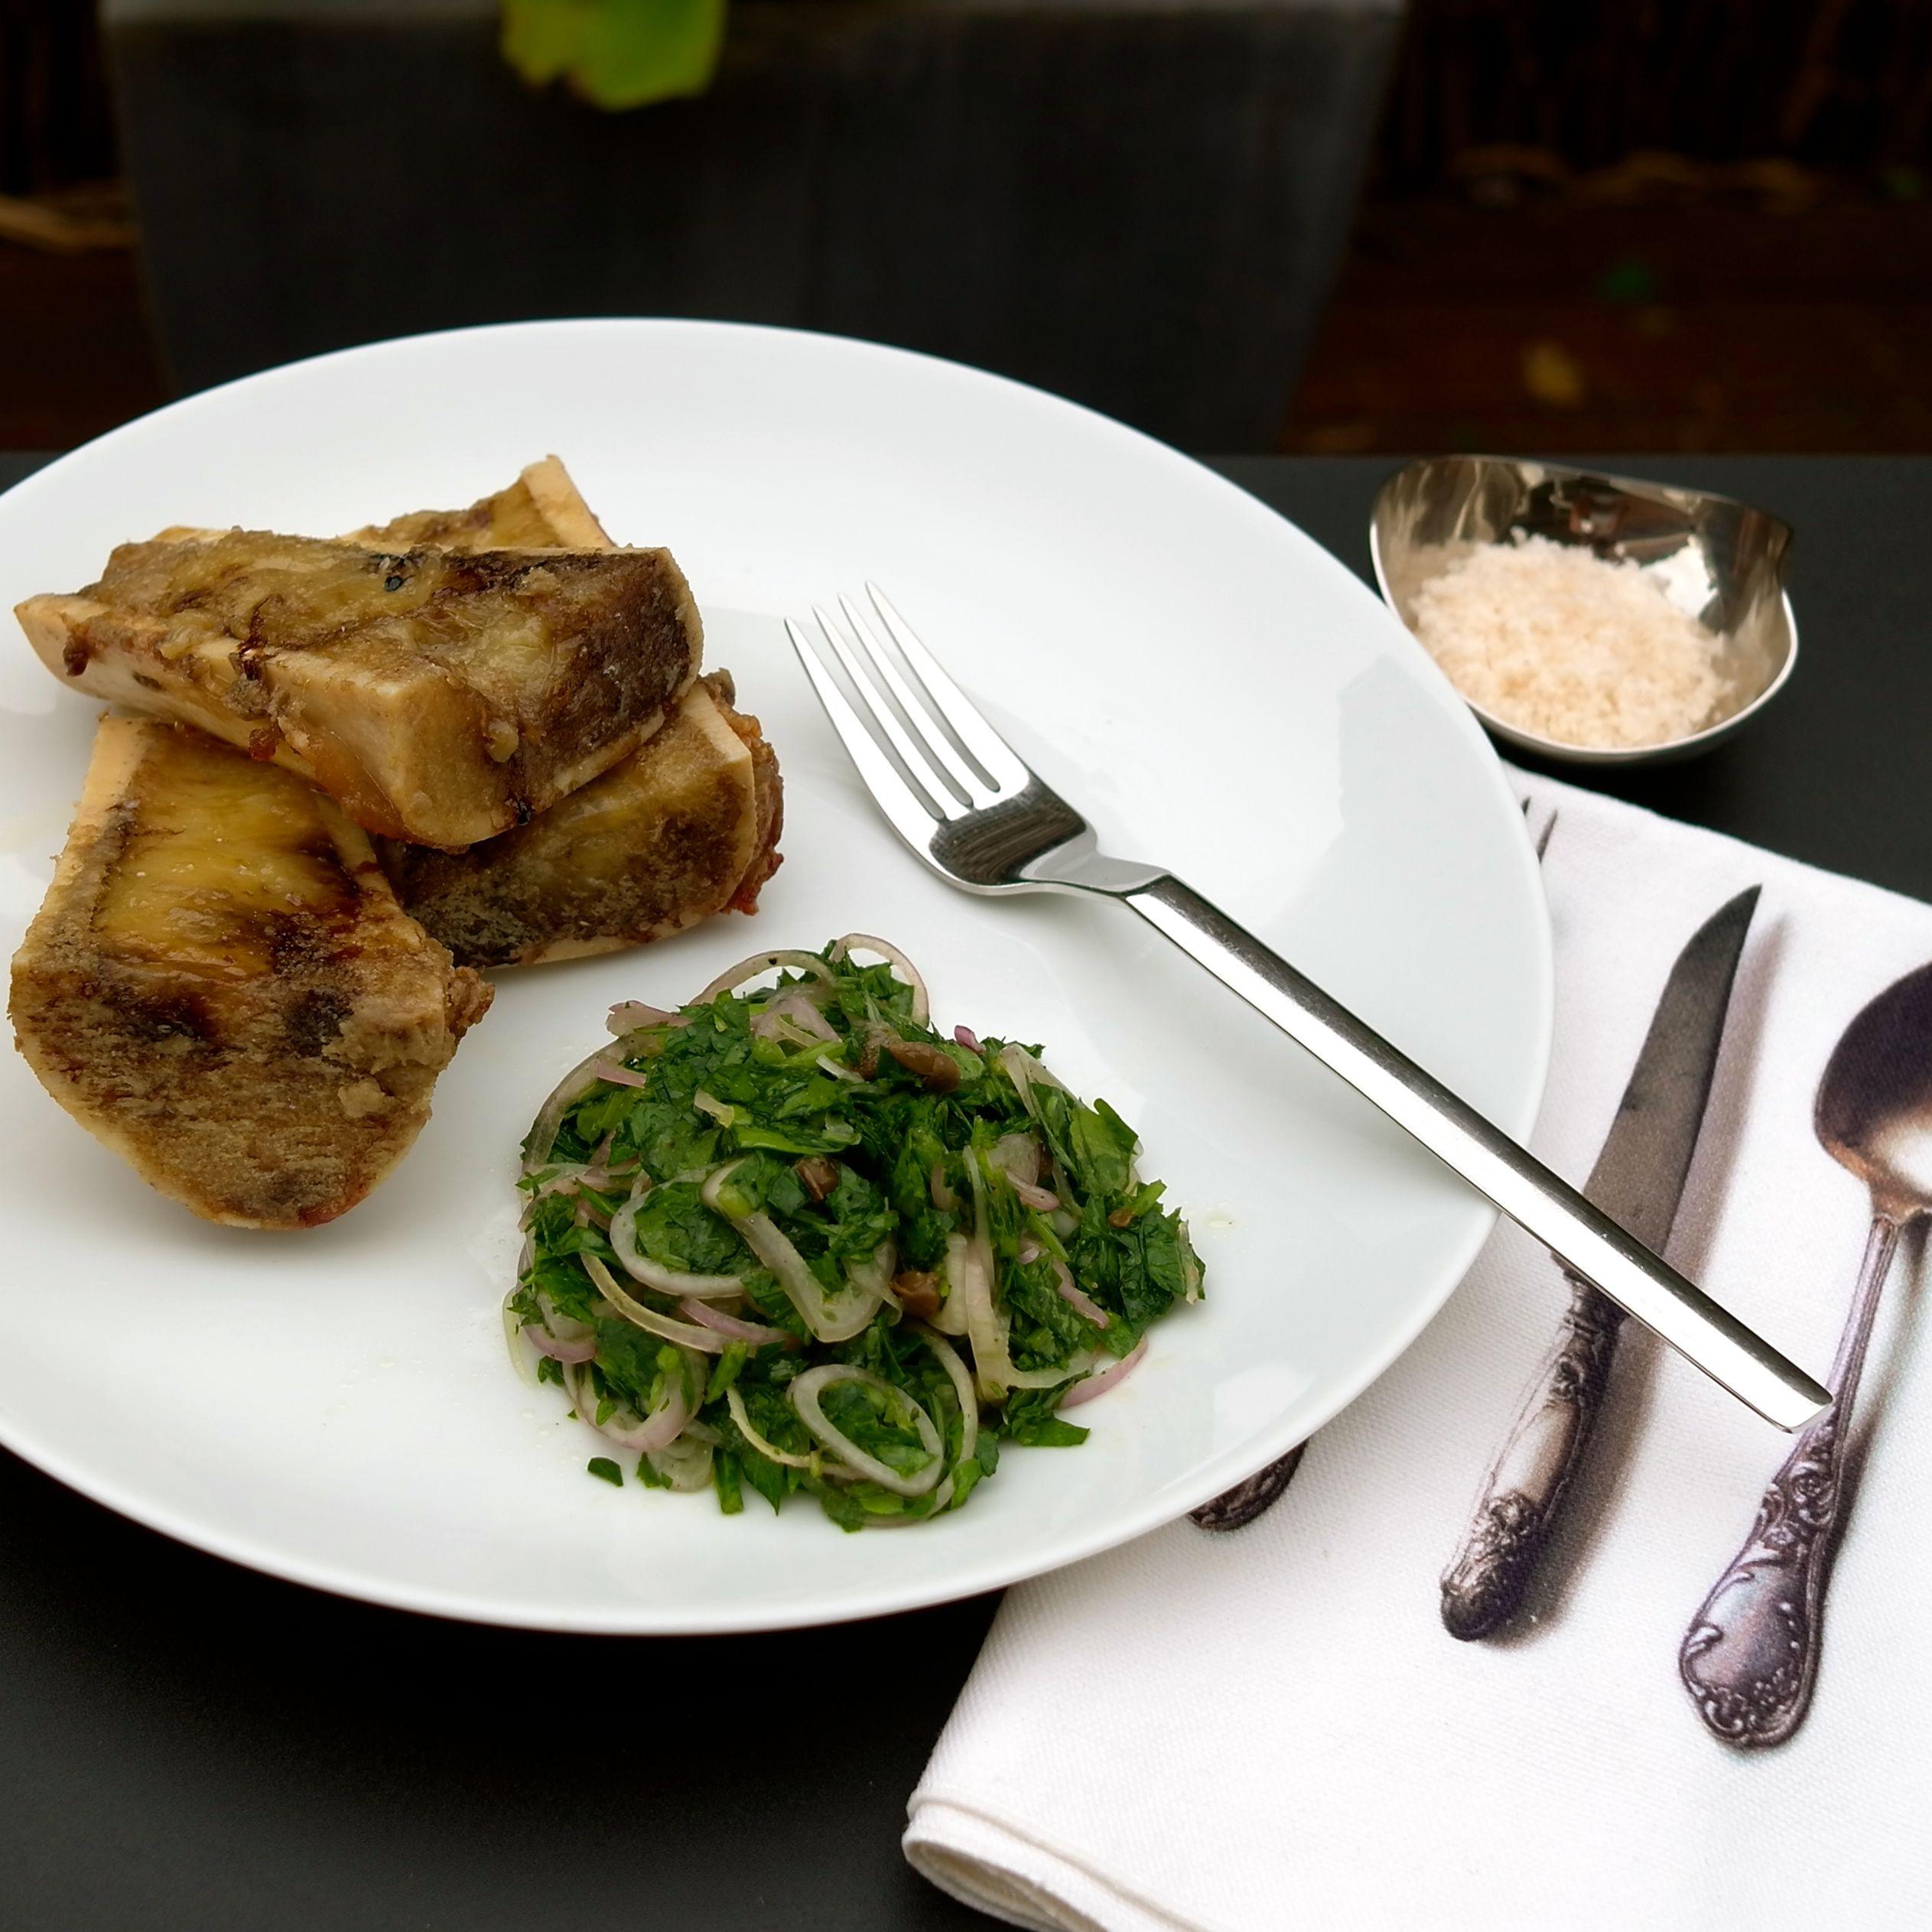 Roasted Bone Marrow with a Side of Parsley Salad